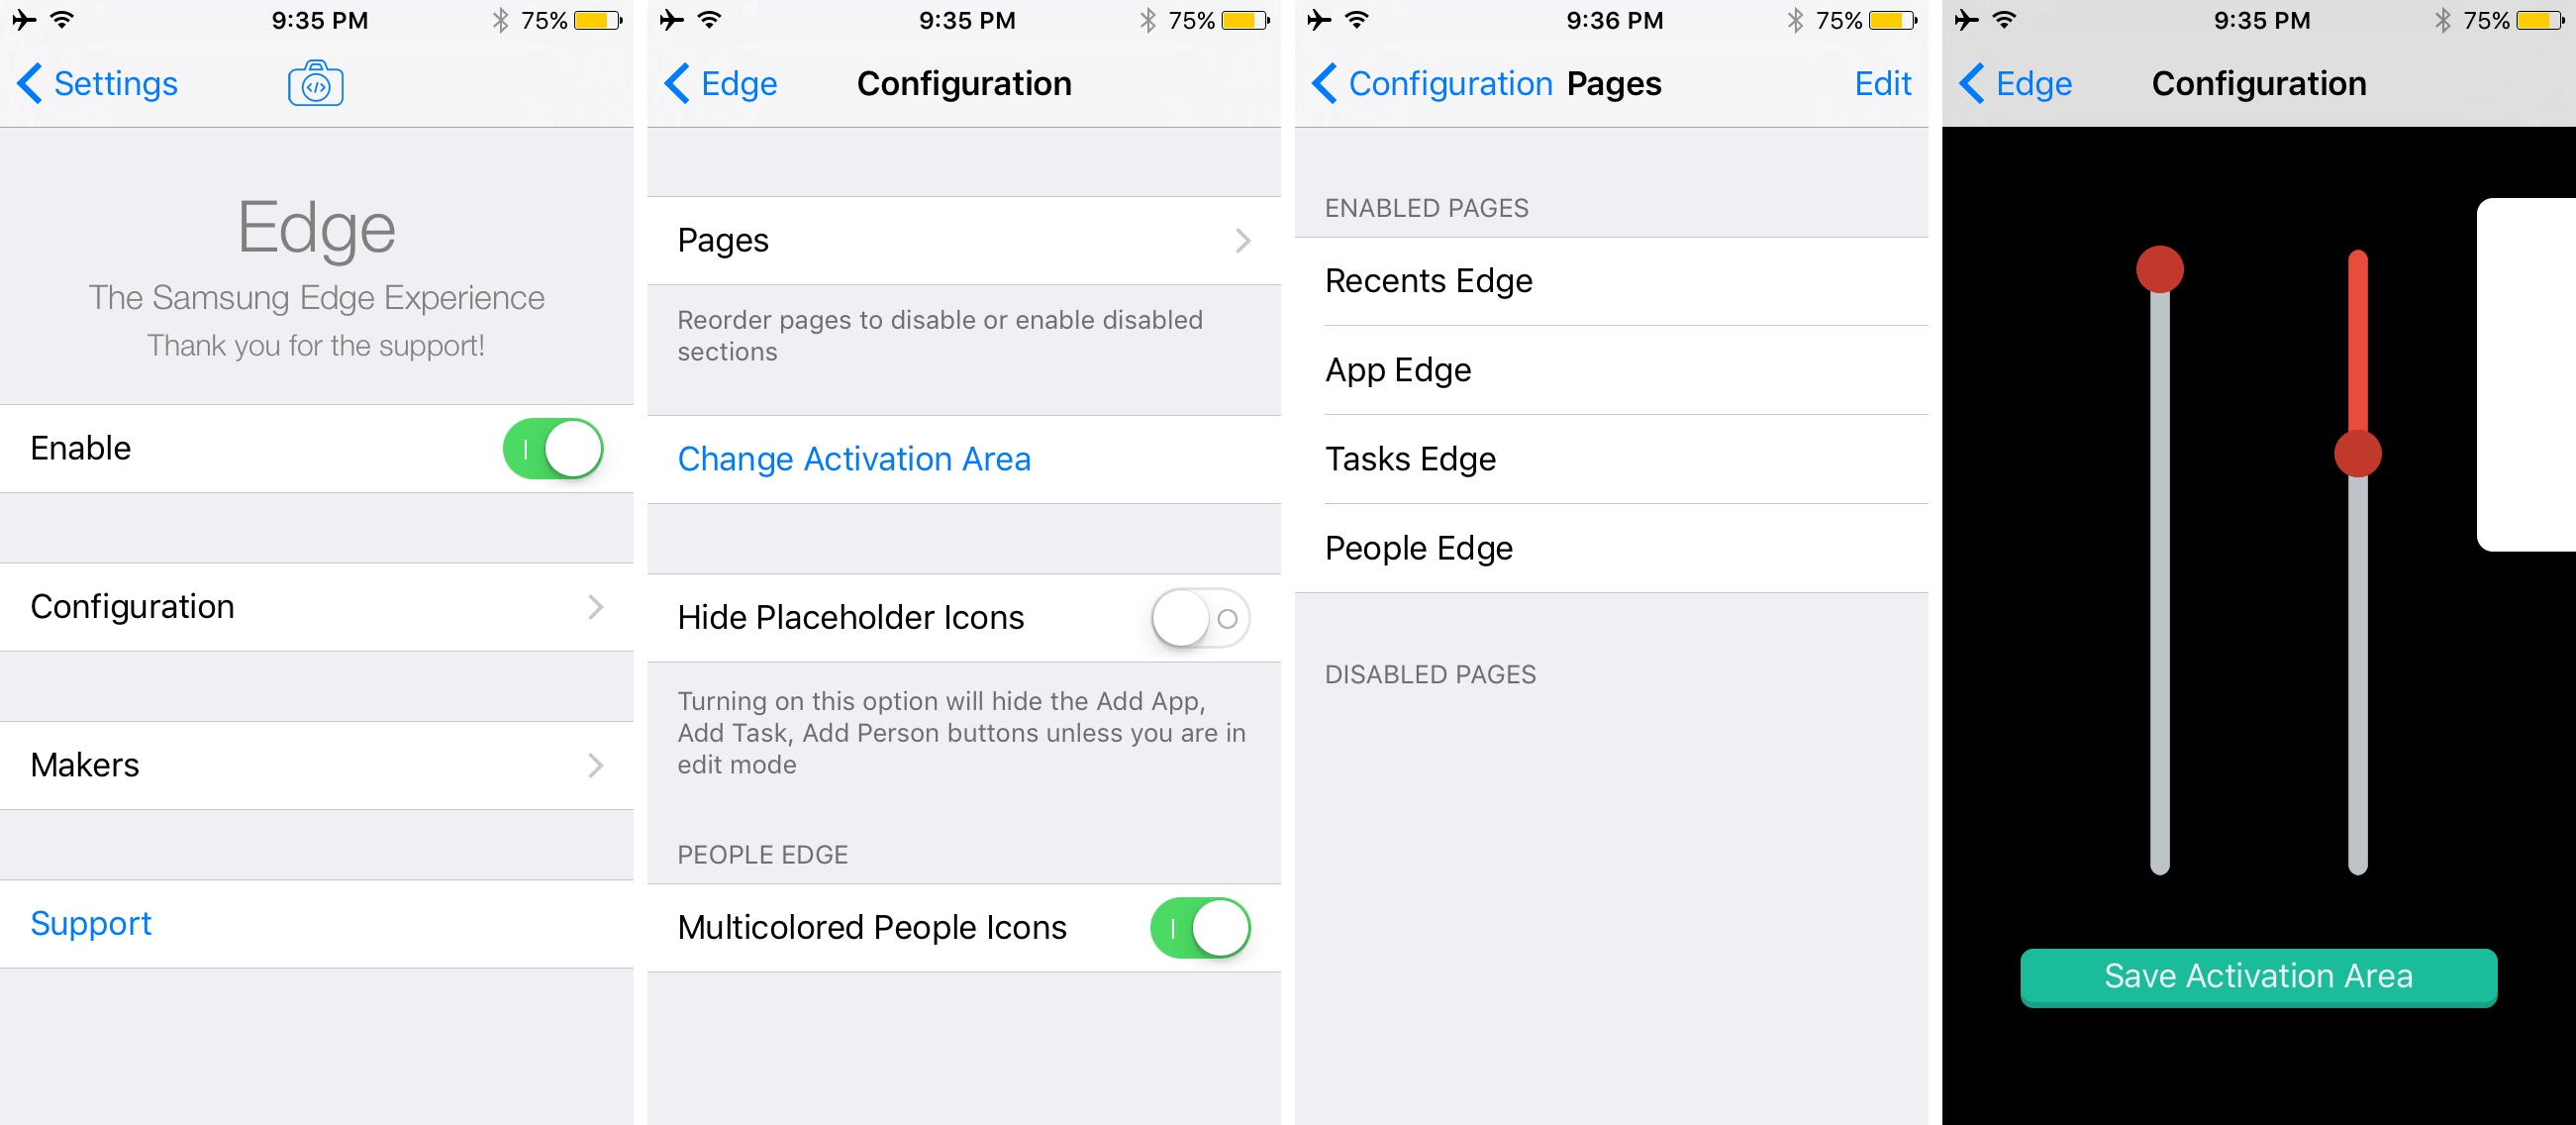 Edge Preferences Pane Options to Configure